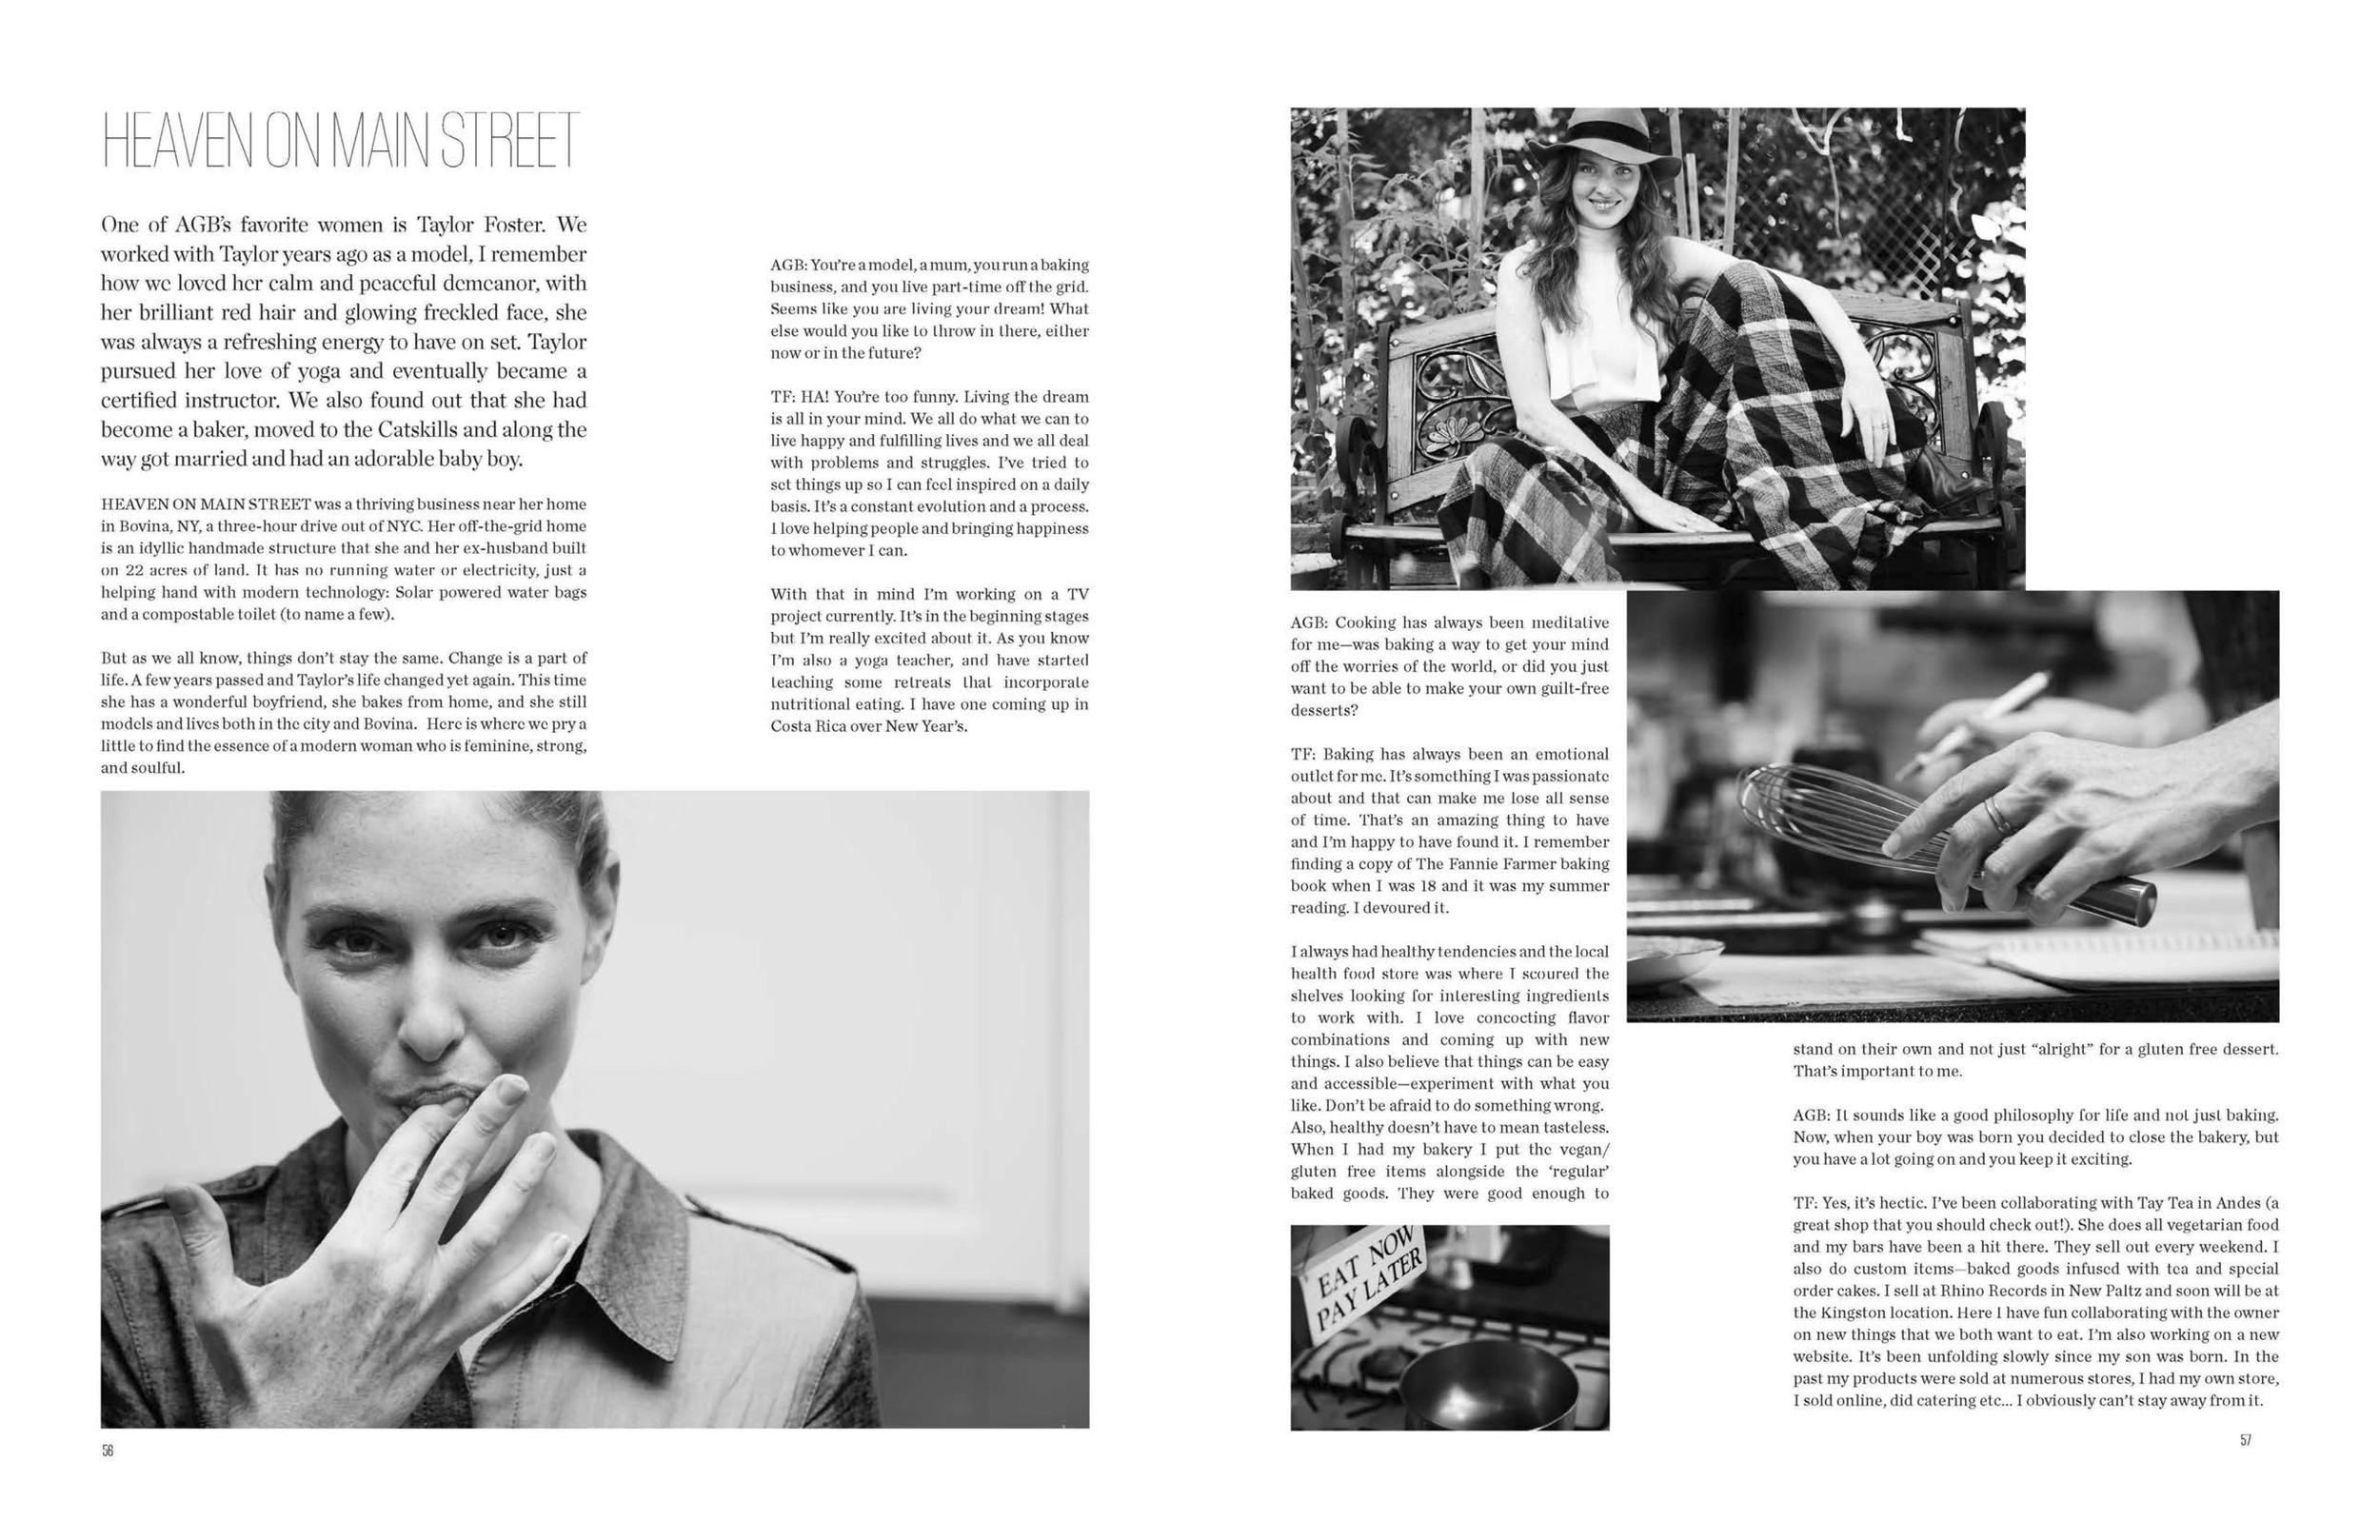 TAYLOR FOSTER PRESS-KIT pg15.jpg